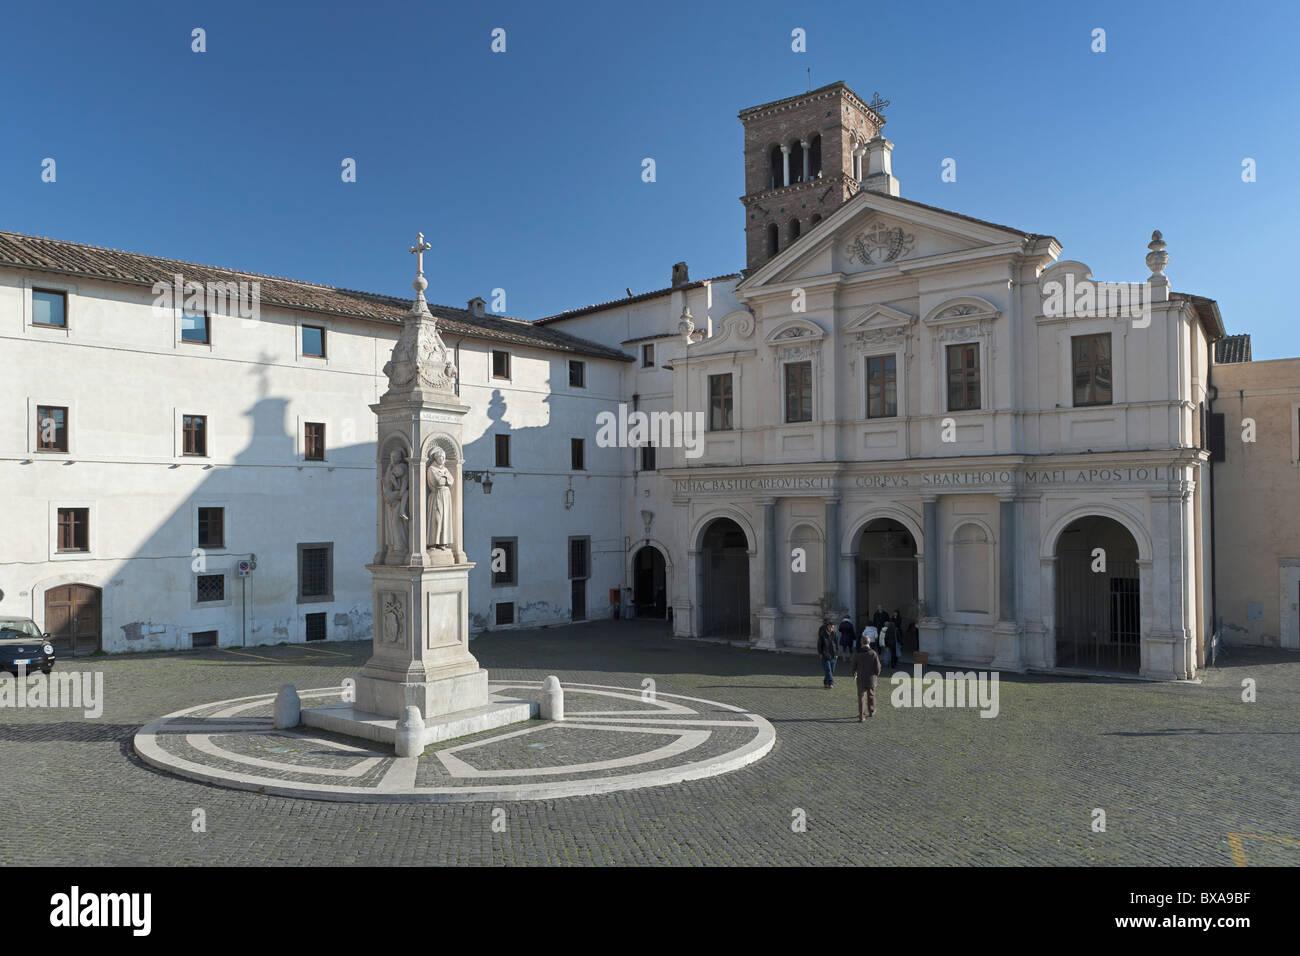 The Church of Saint Bartholomew,Tiber Island, Rome,Italy - Stock Image